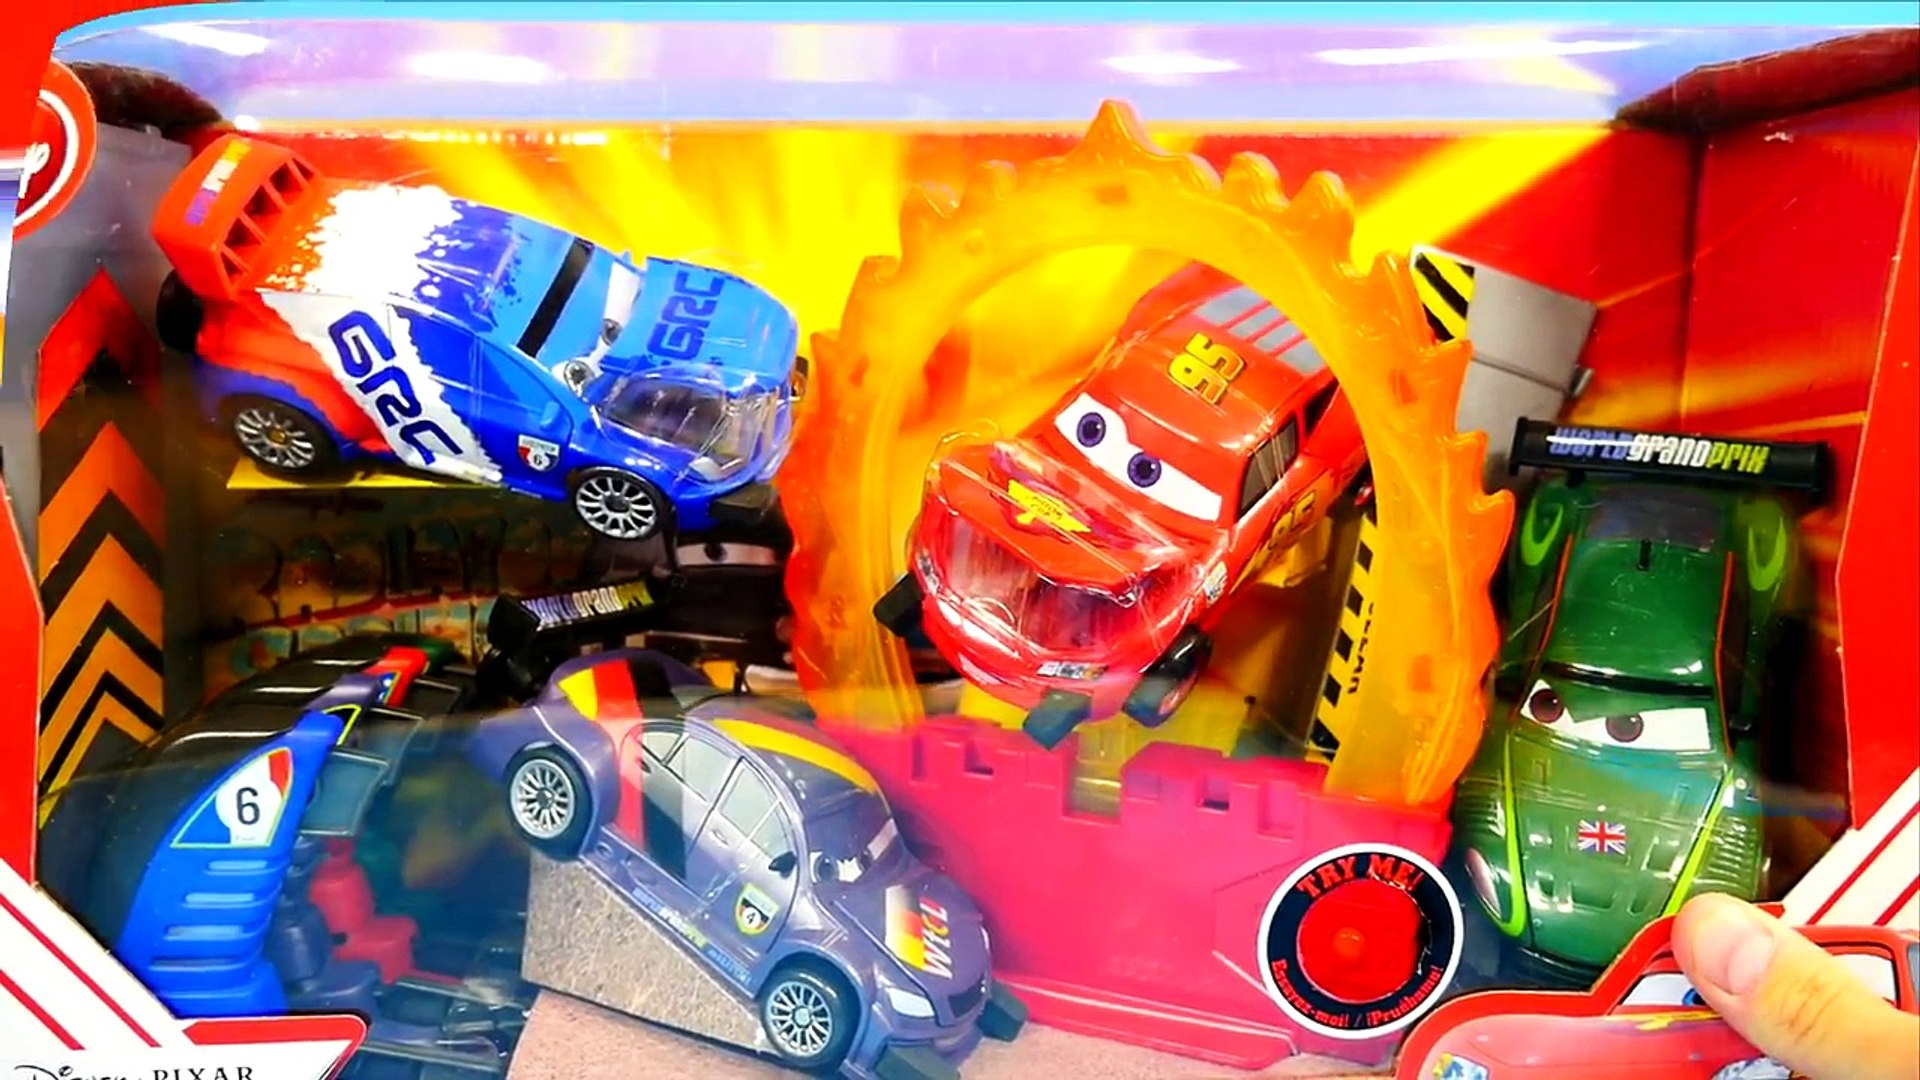 Cars 2 Ring Of Fire Stunt Lightning Mcqueen Crashing Disney Pixar Launching Car Toys Dailymotion Video